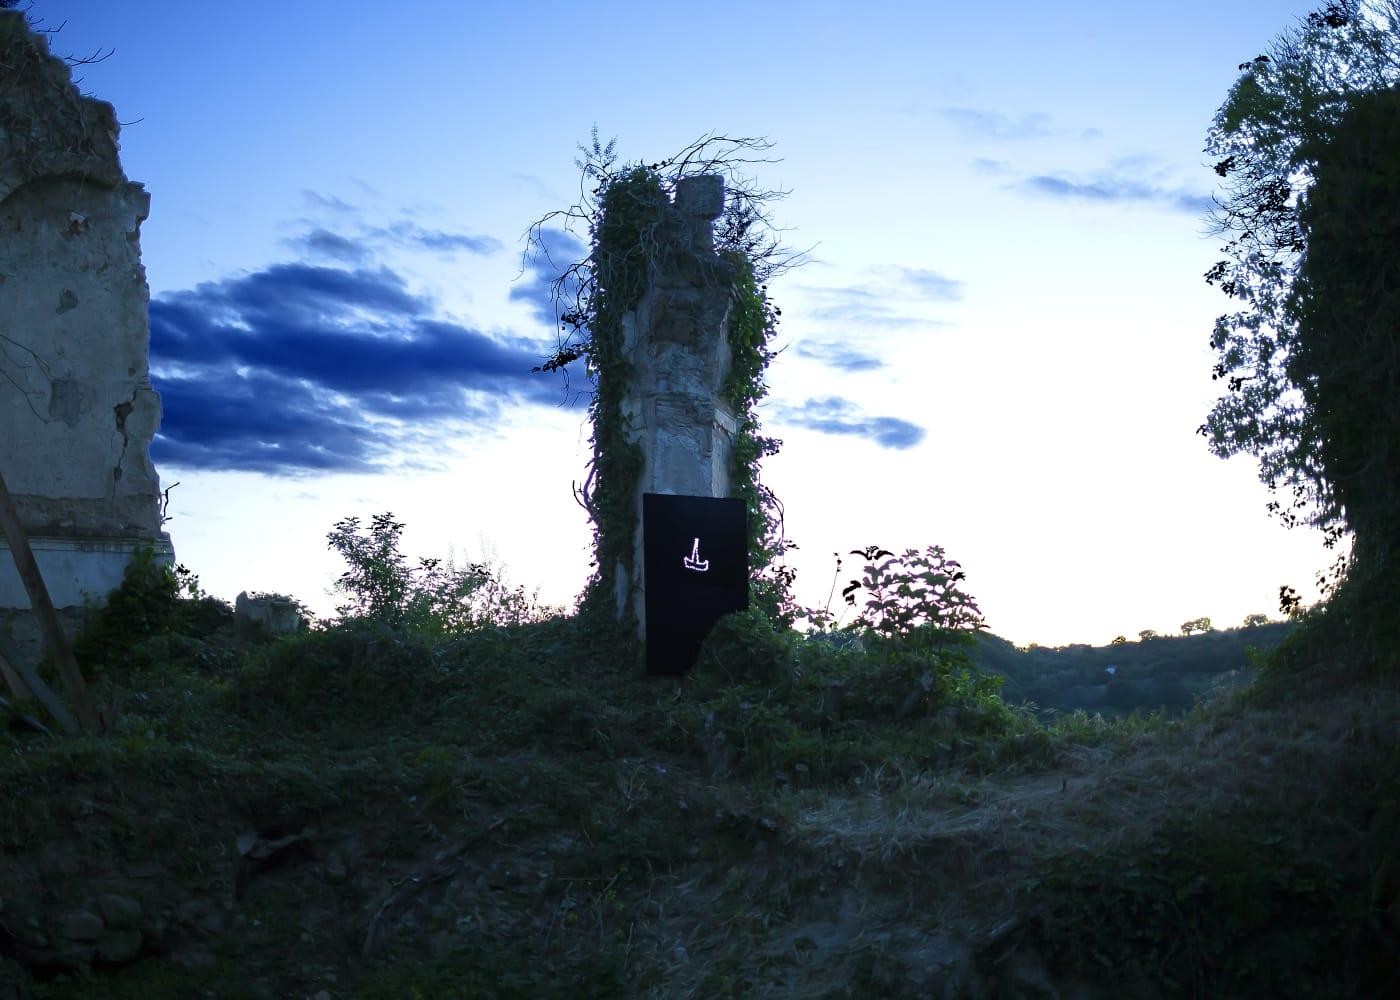 respiro_chiara_tommasi_foto